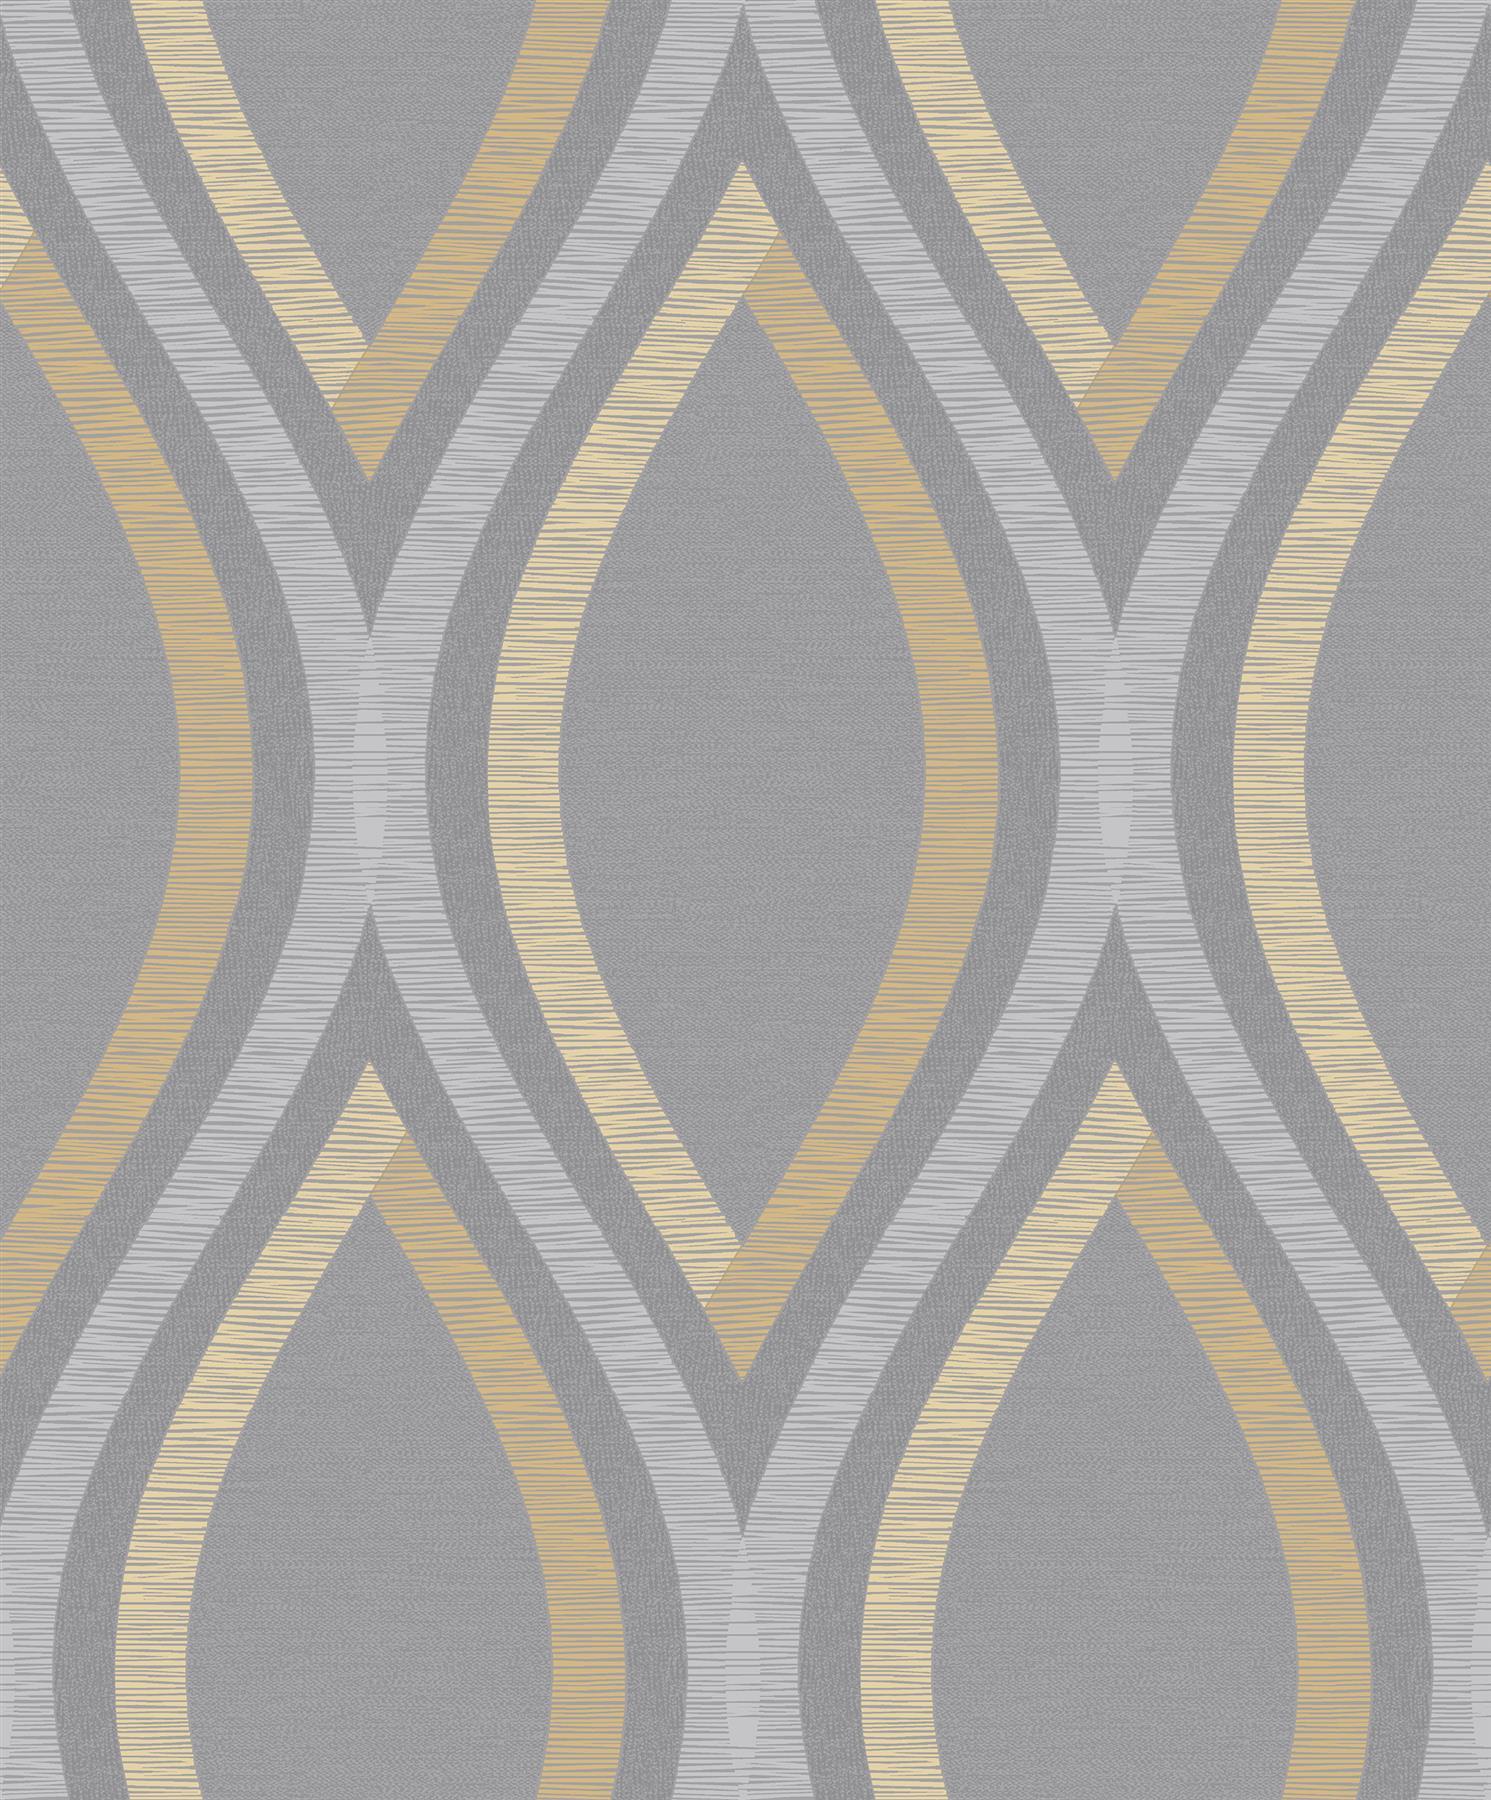 Strata Geometric Curve Wallpaper Black Gold Metallic Textured Embossed Grandeco